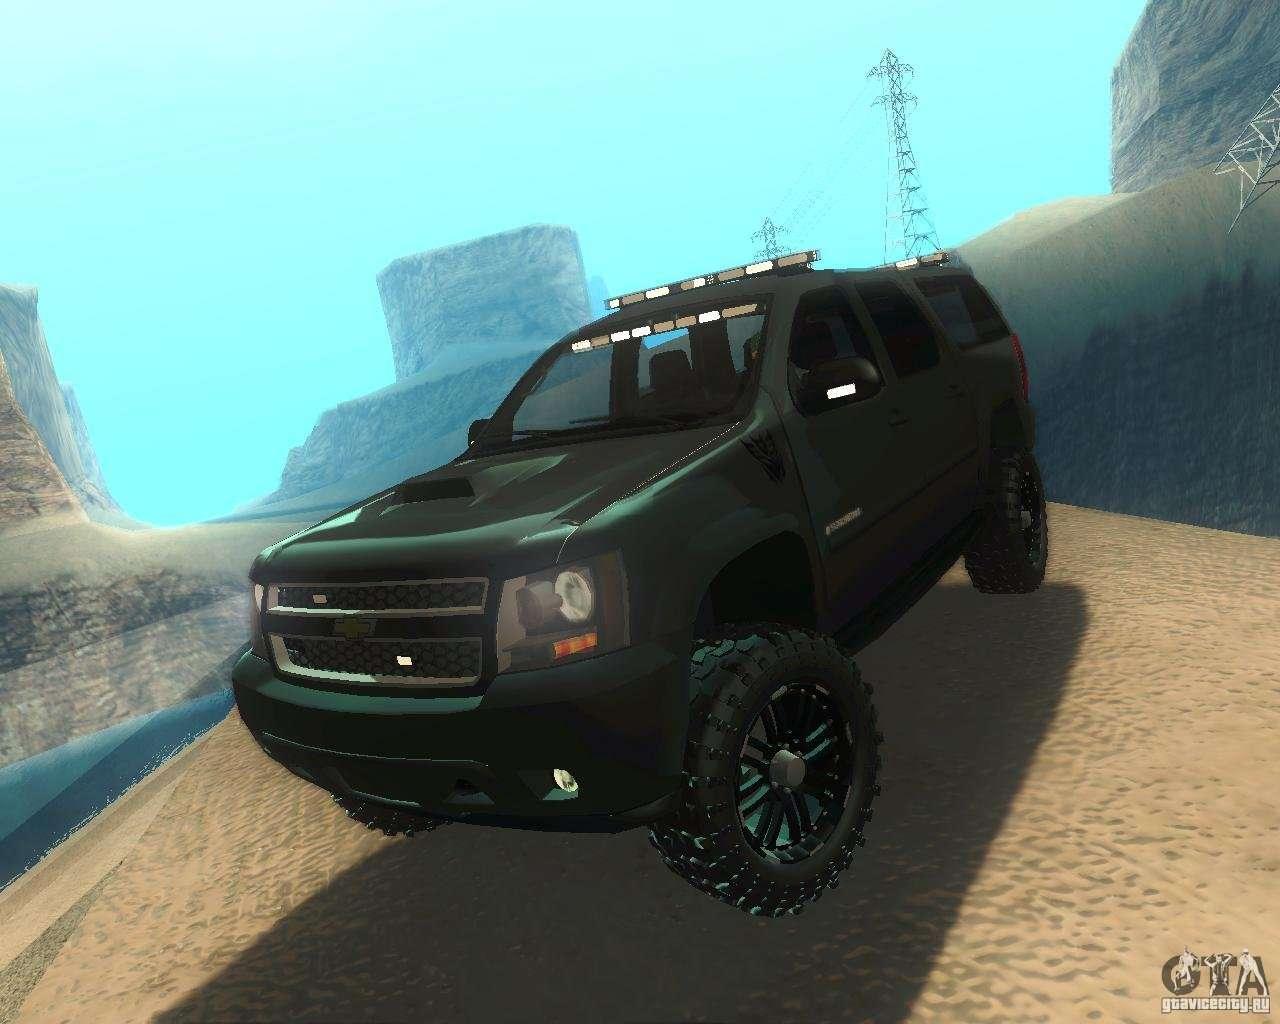 Chevrolet Suburban Lax Airport Police For Gta San Andreas: Chevrolet Suburban Crankcase Transformers 3 для GTA San